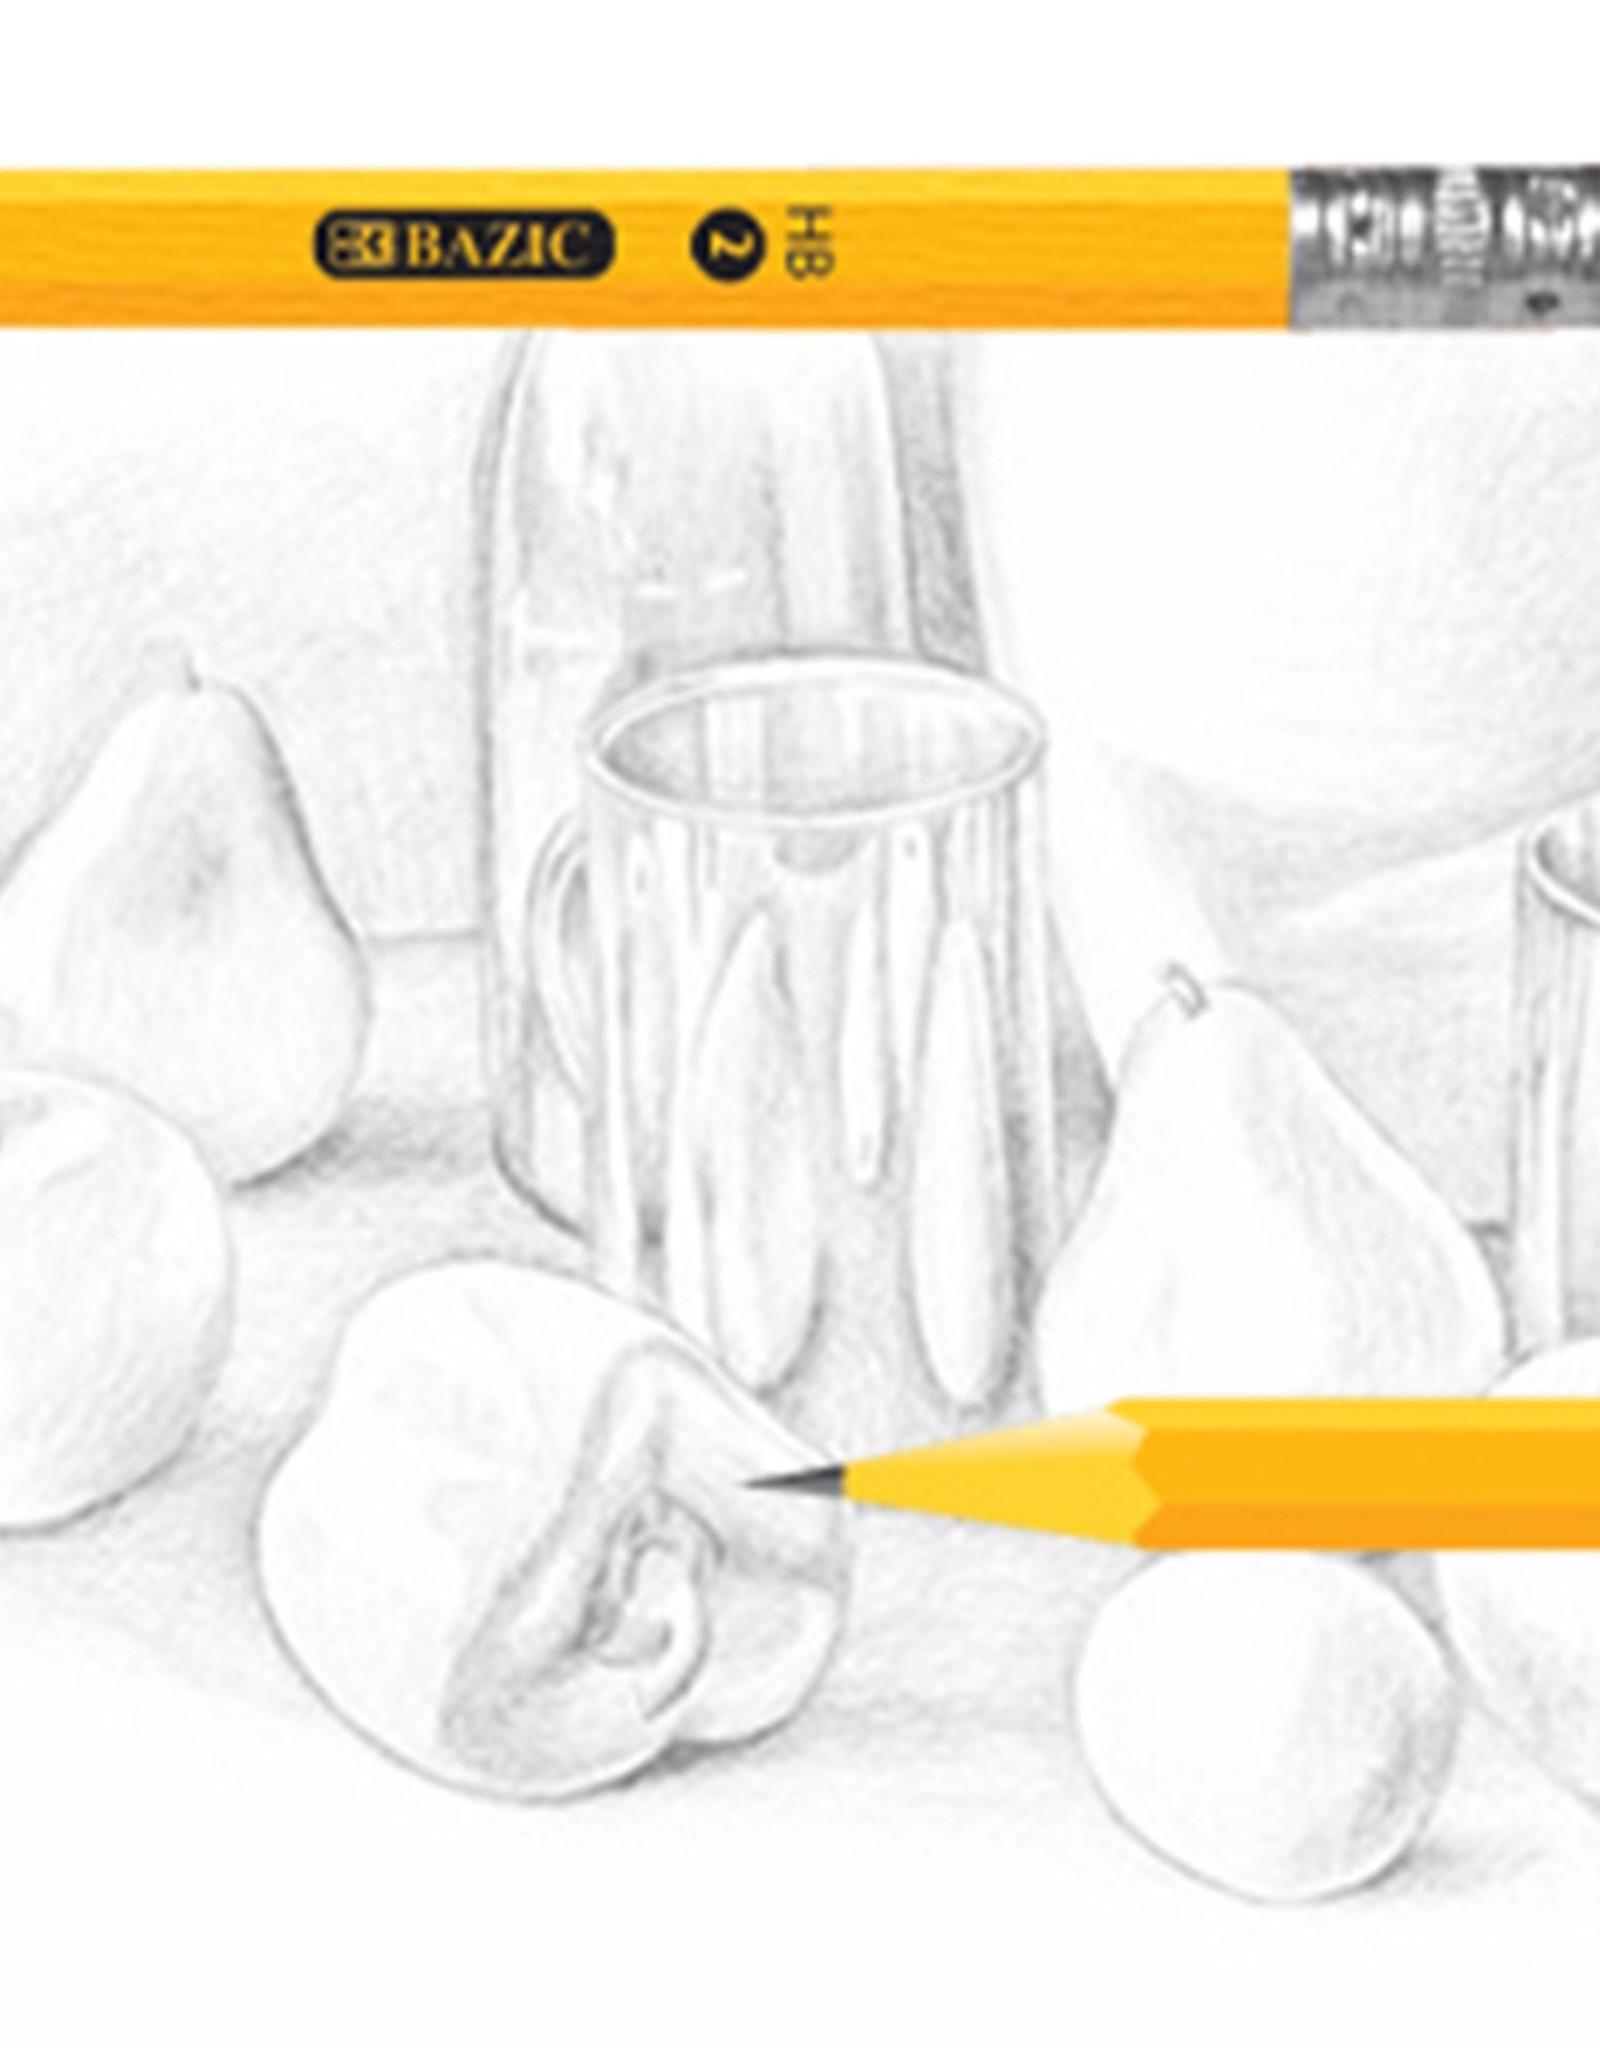 #2 Yellow Pencil